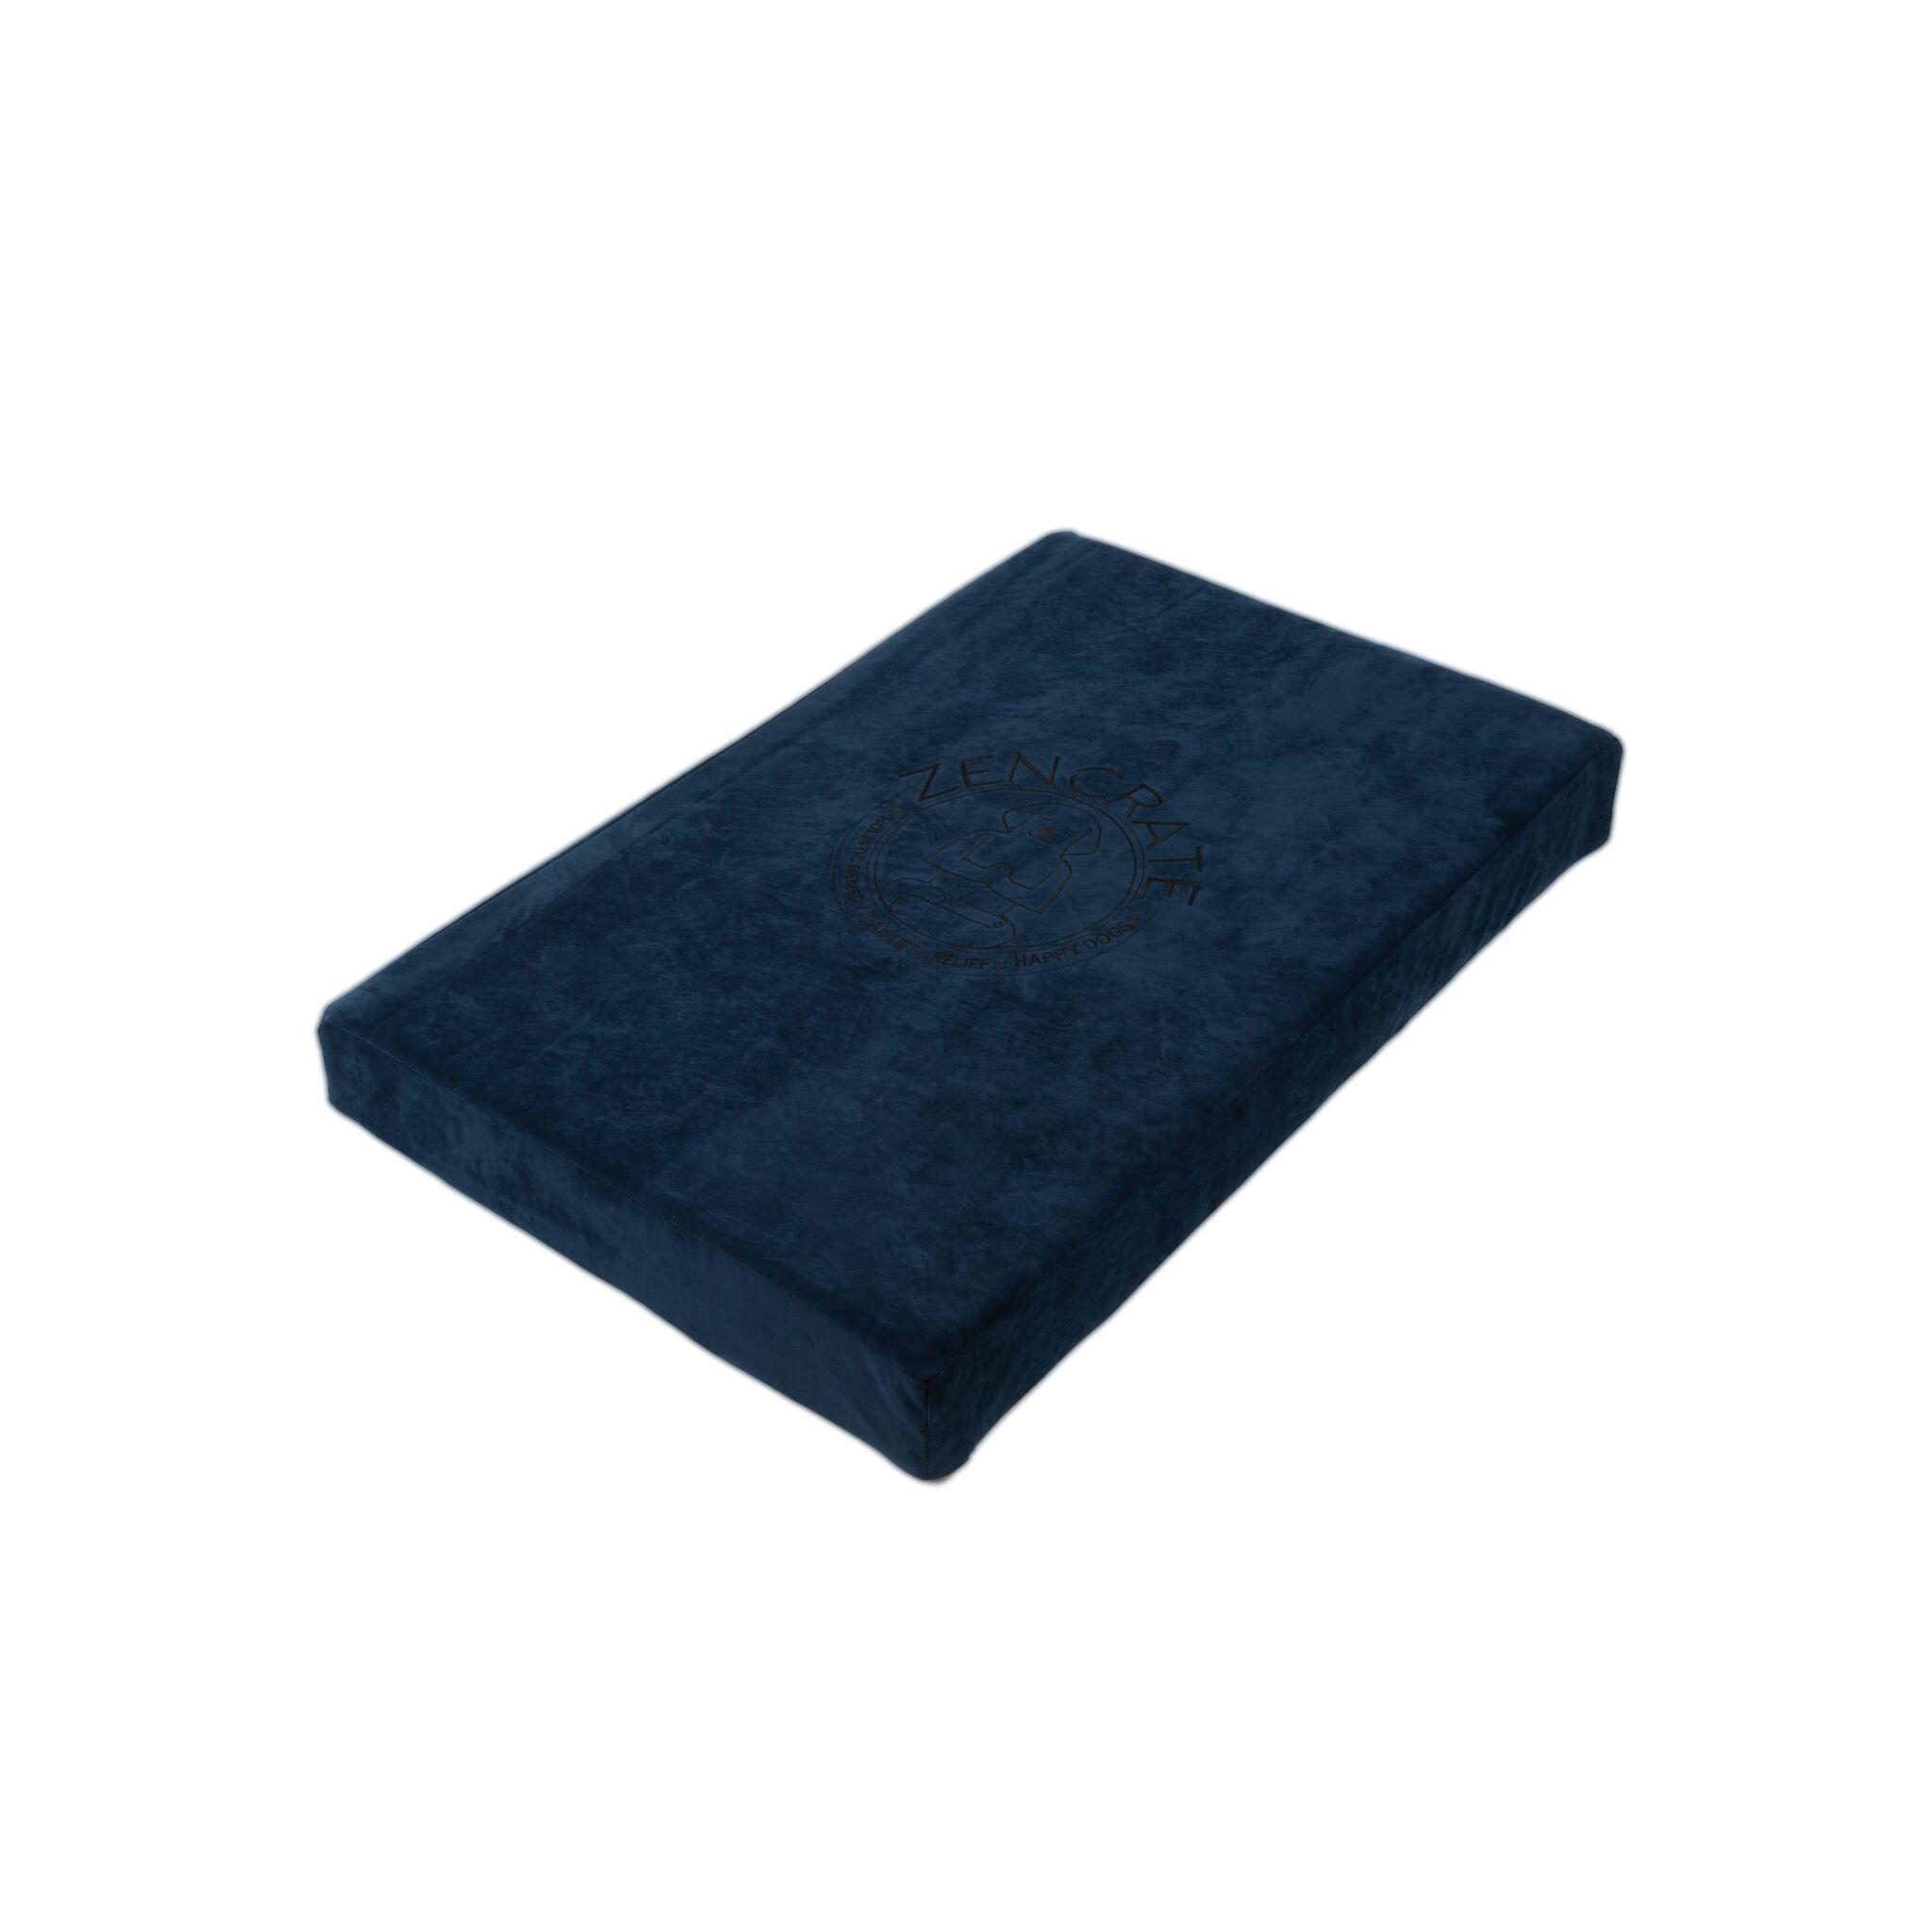 Waterproof Memory Foam Dog Bed Color: Navy